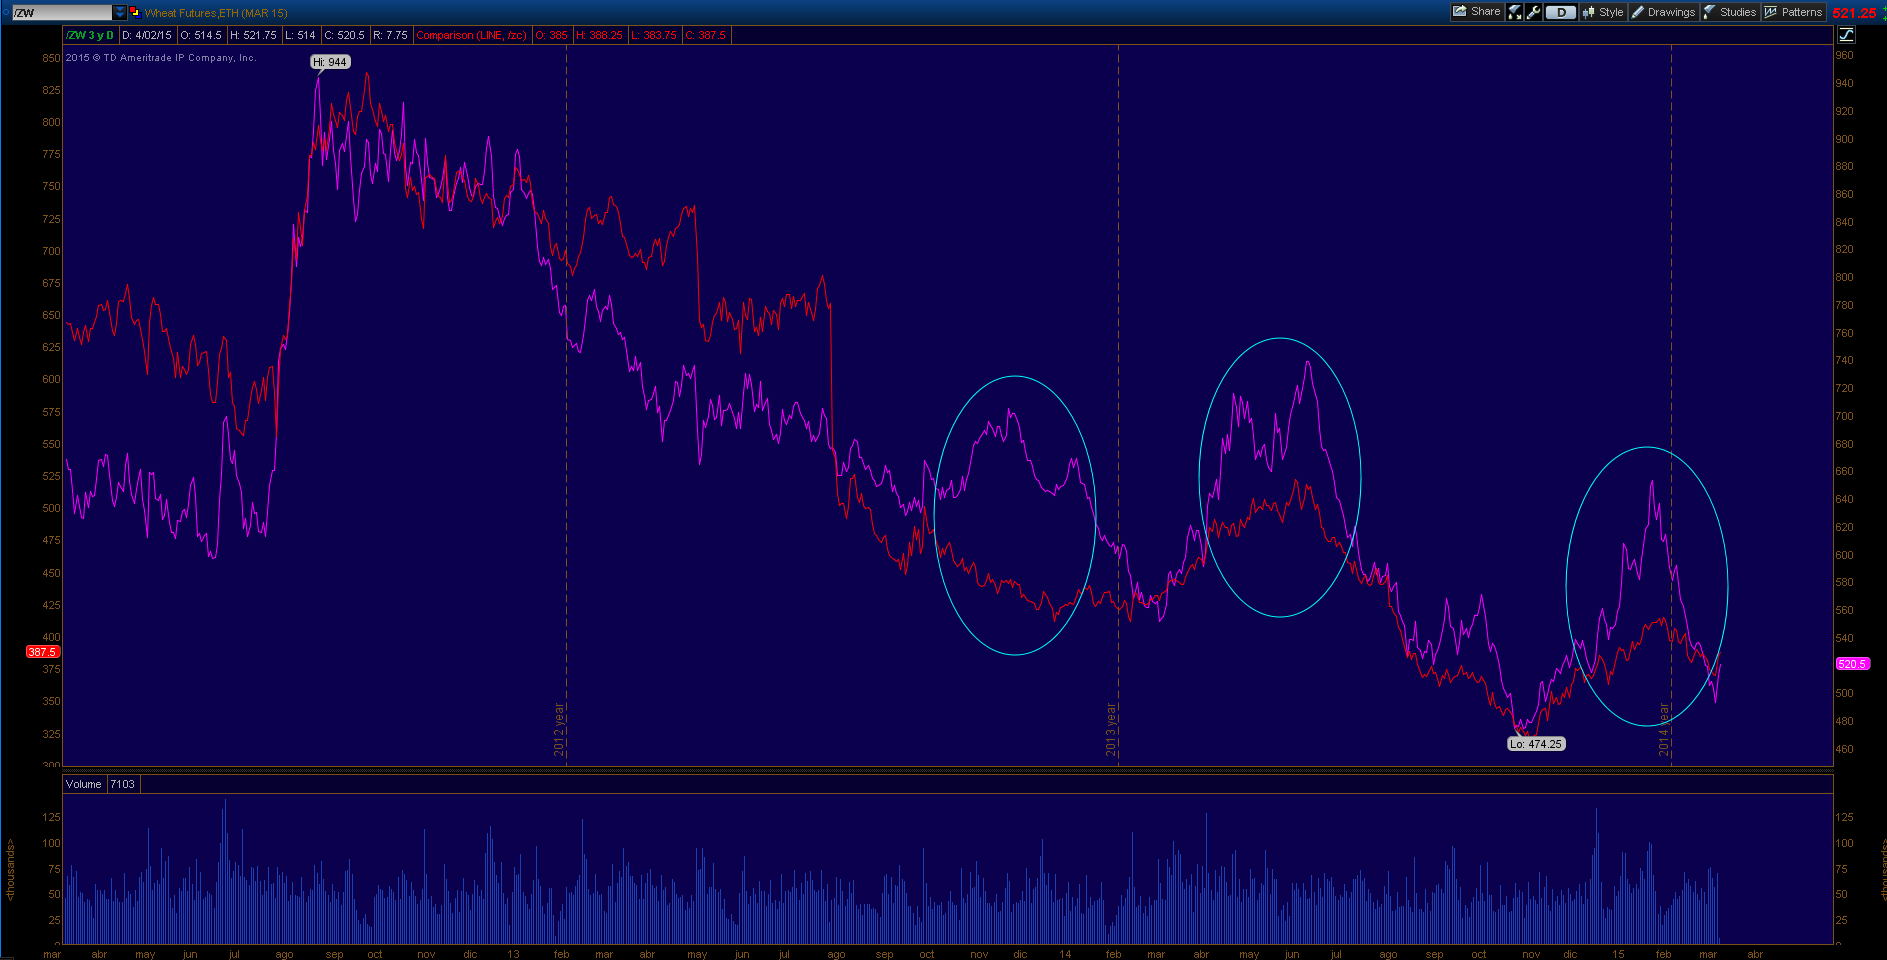 Wheat - corn volatilidad